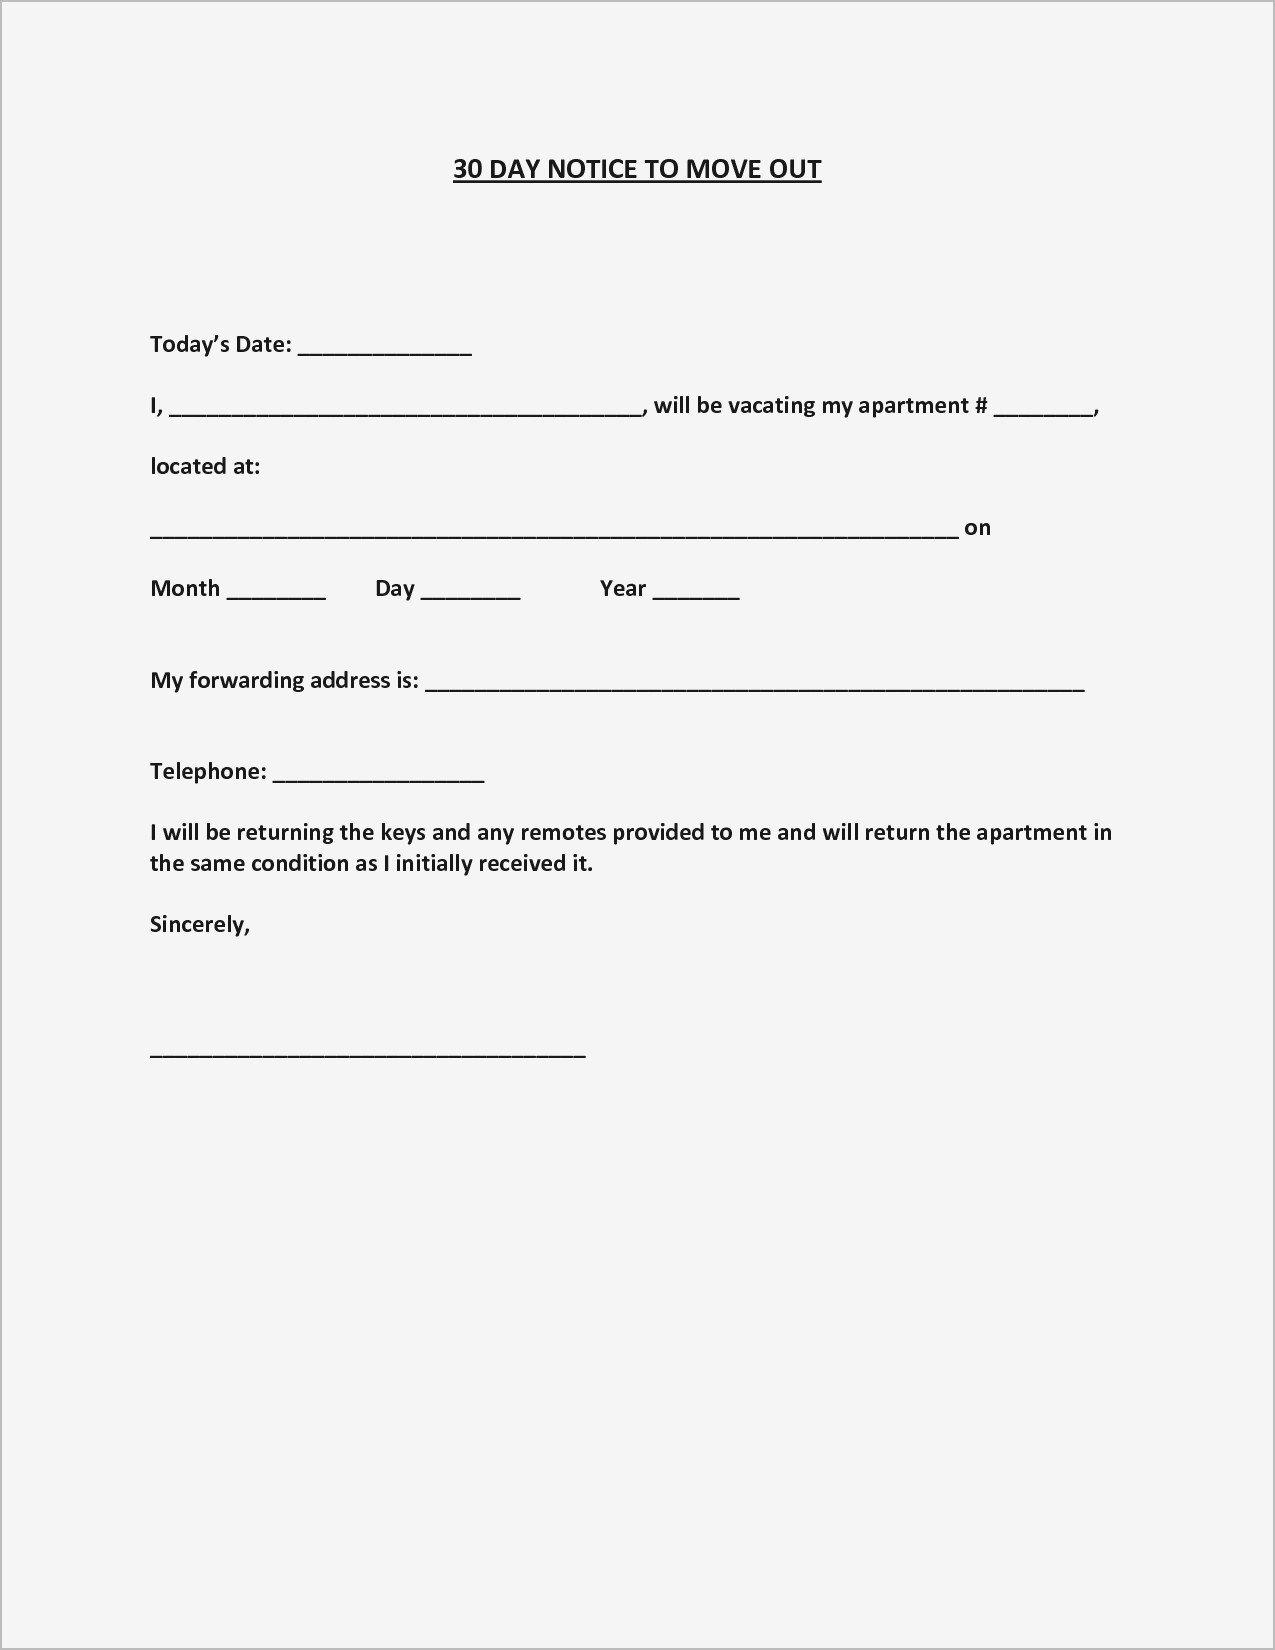 Notarized Letter Of Residency Notarized Letter Template for Residency Samples